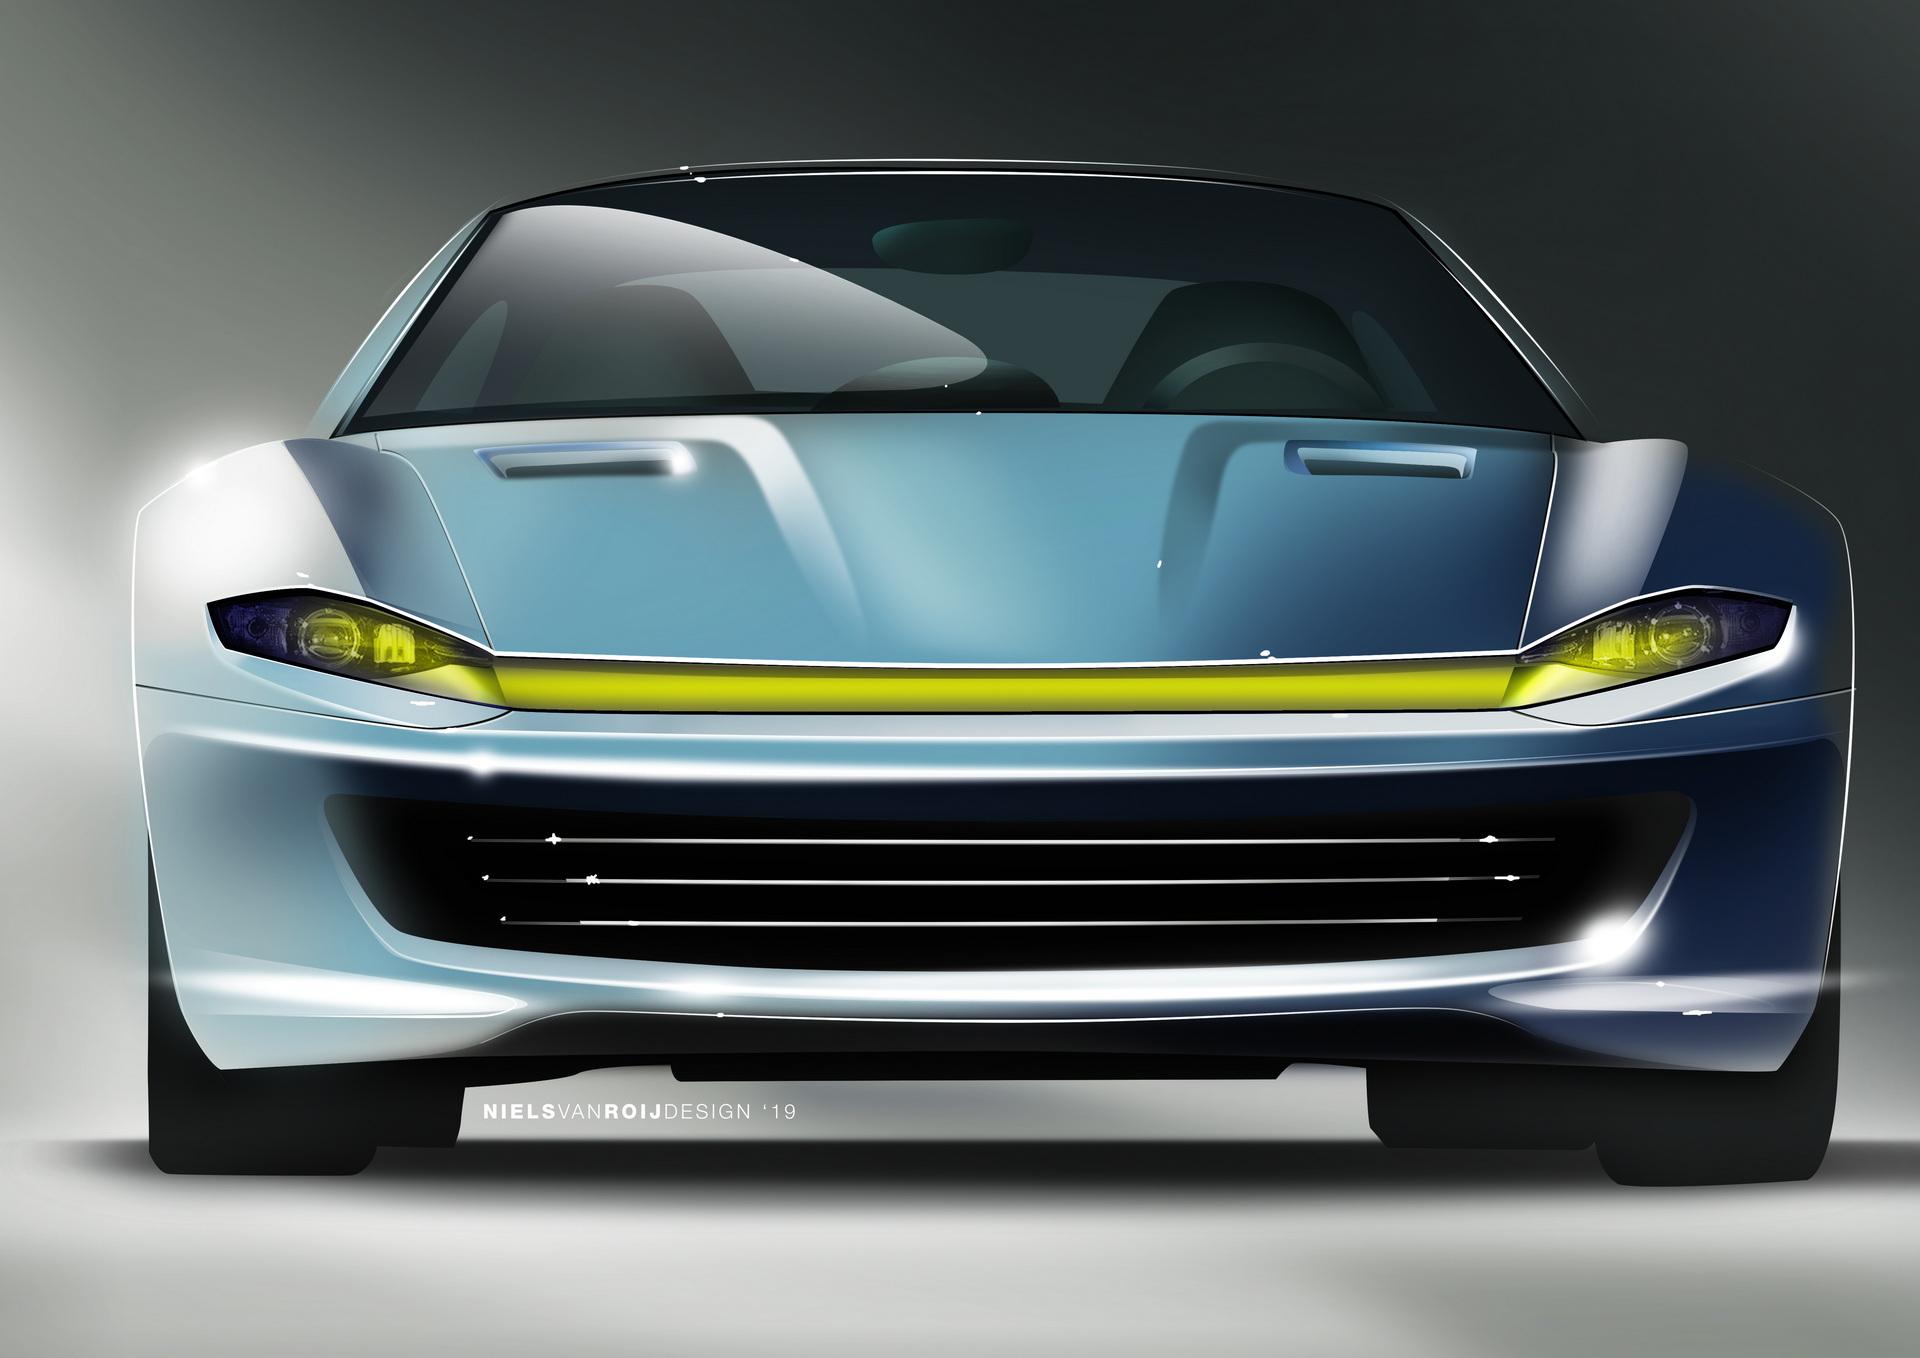 Ferrari-Daytona-Shooting-Brake-Hommage-by-Niels-van-Roij-Design-32